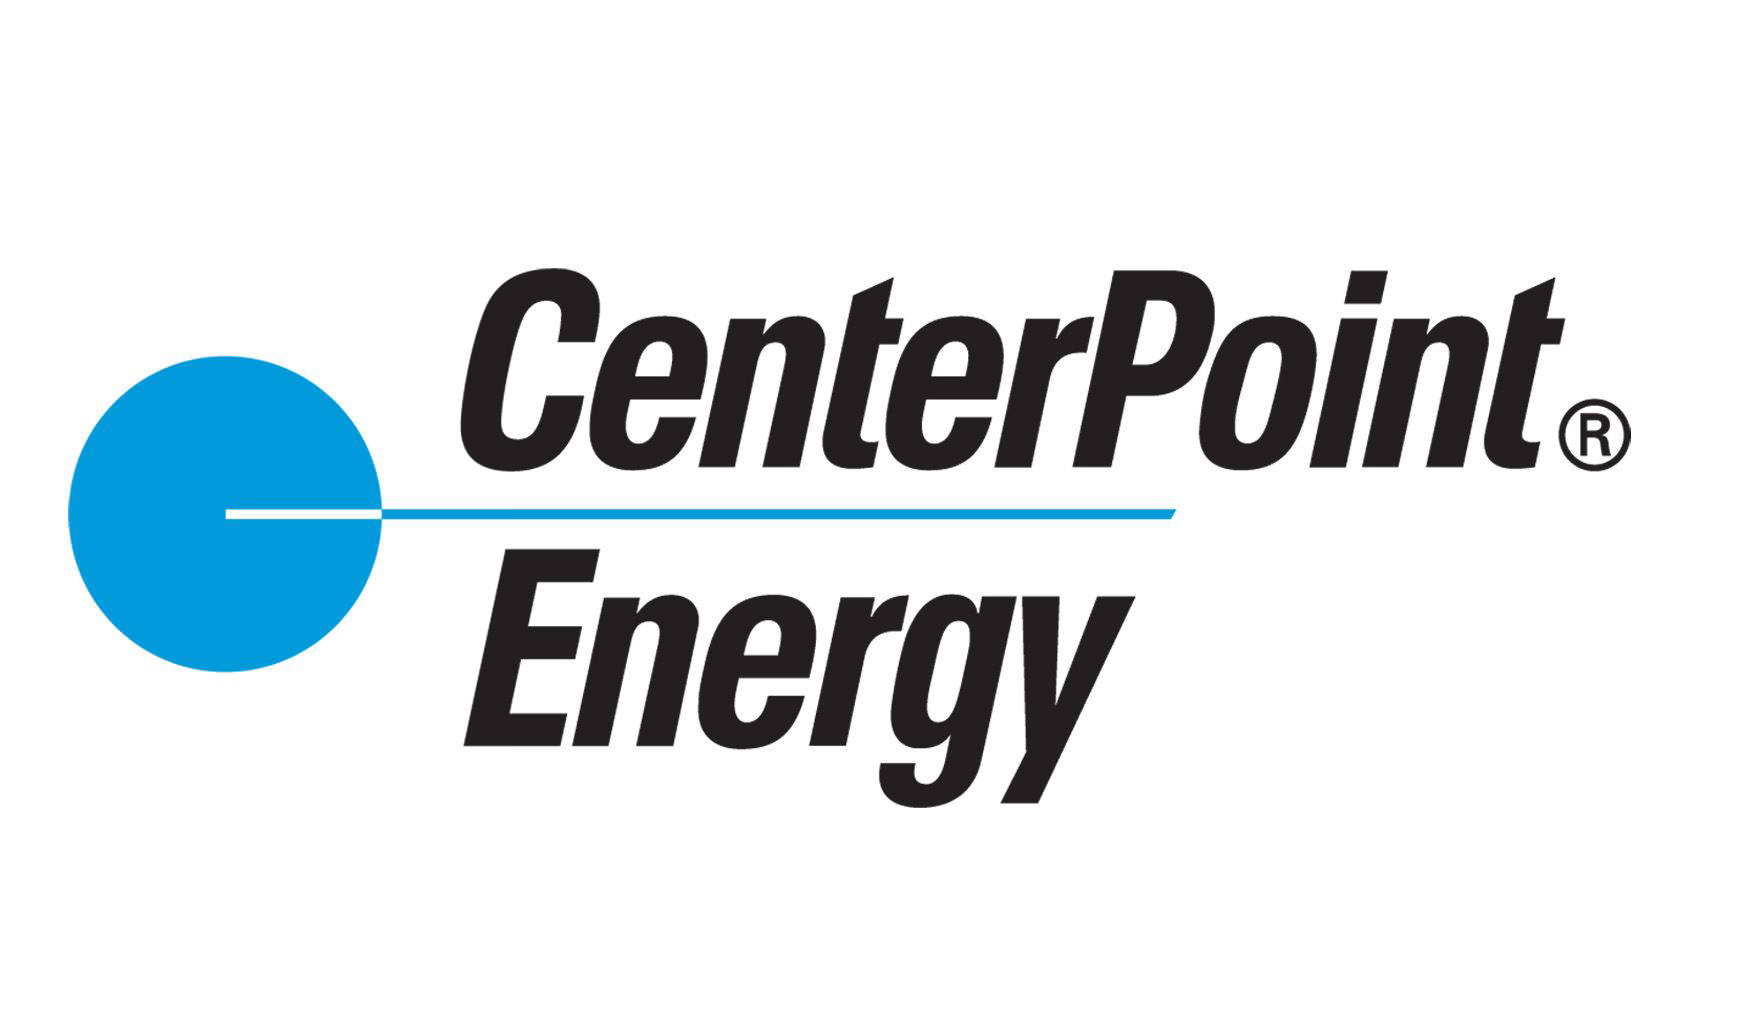 Centerpoint Energy Inc.